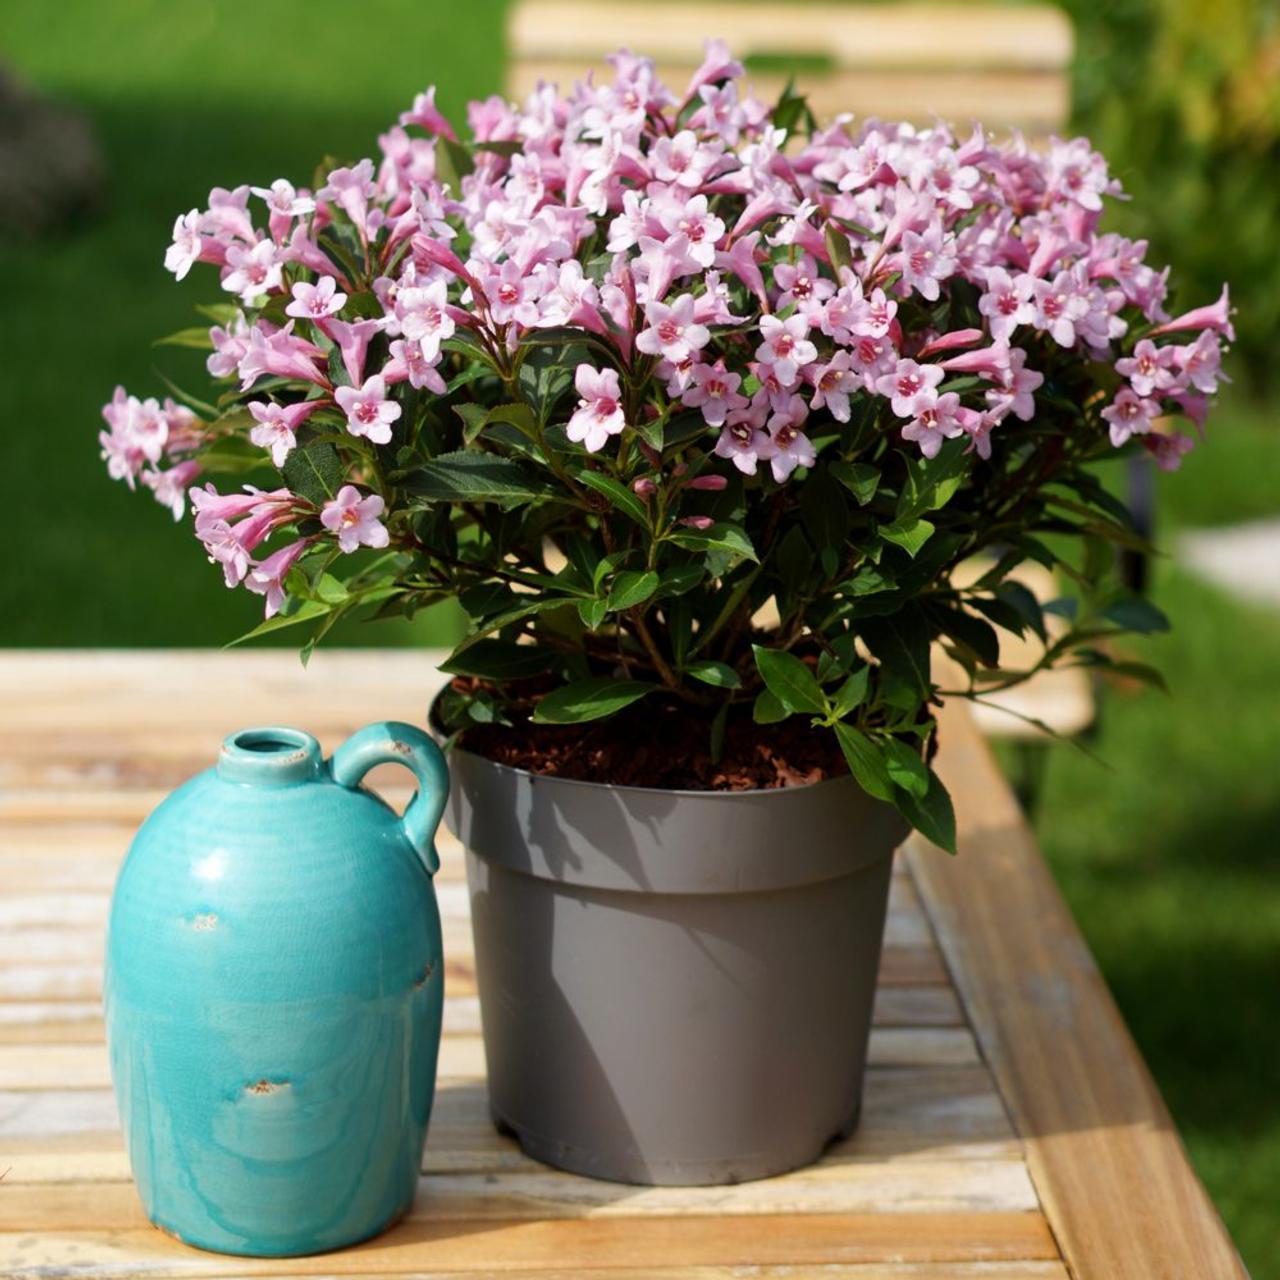 Weigela florida 'Pink Poppet' plant